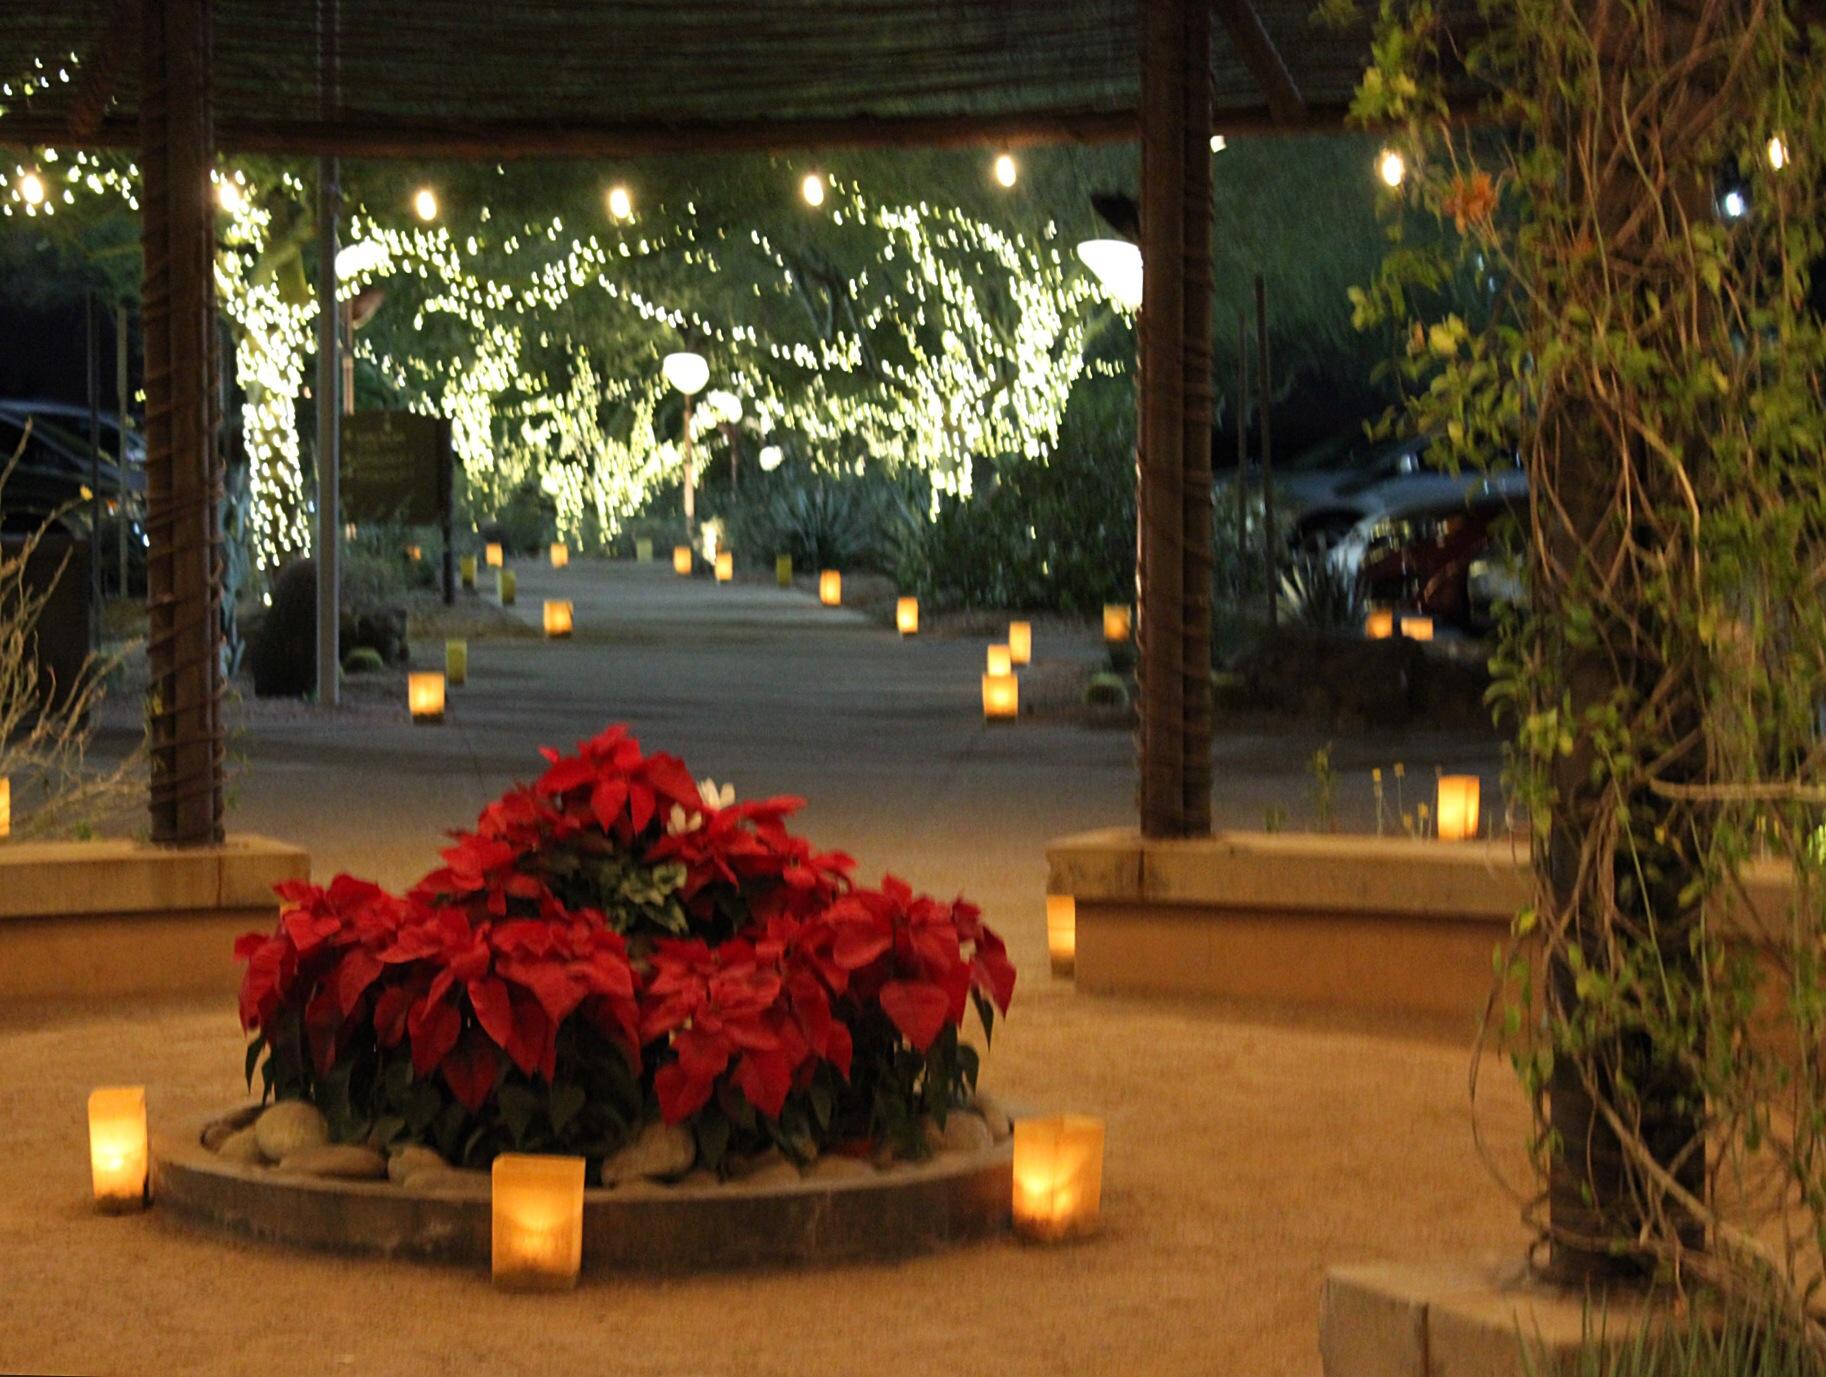 Luminarias at Desert Botanical Gardens – Have Teacup Will Travel